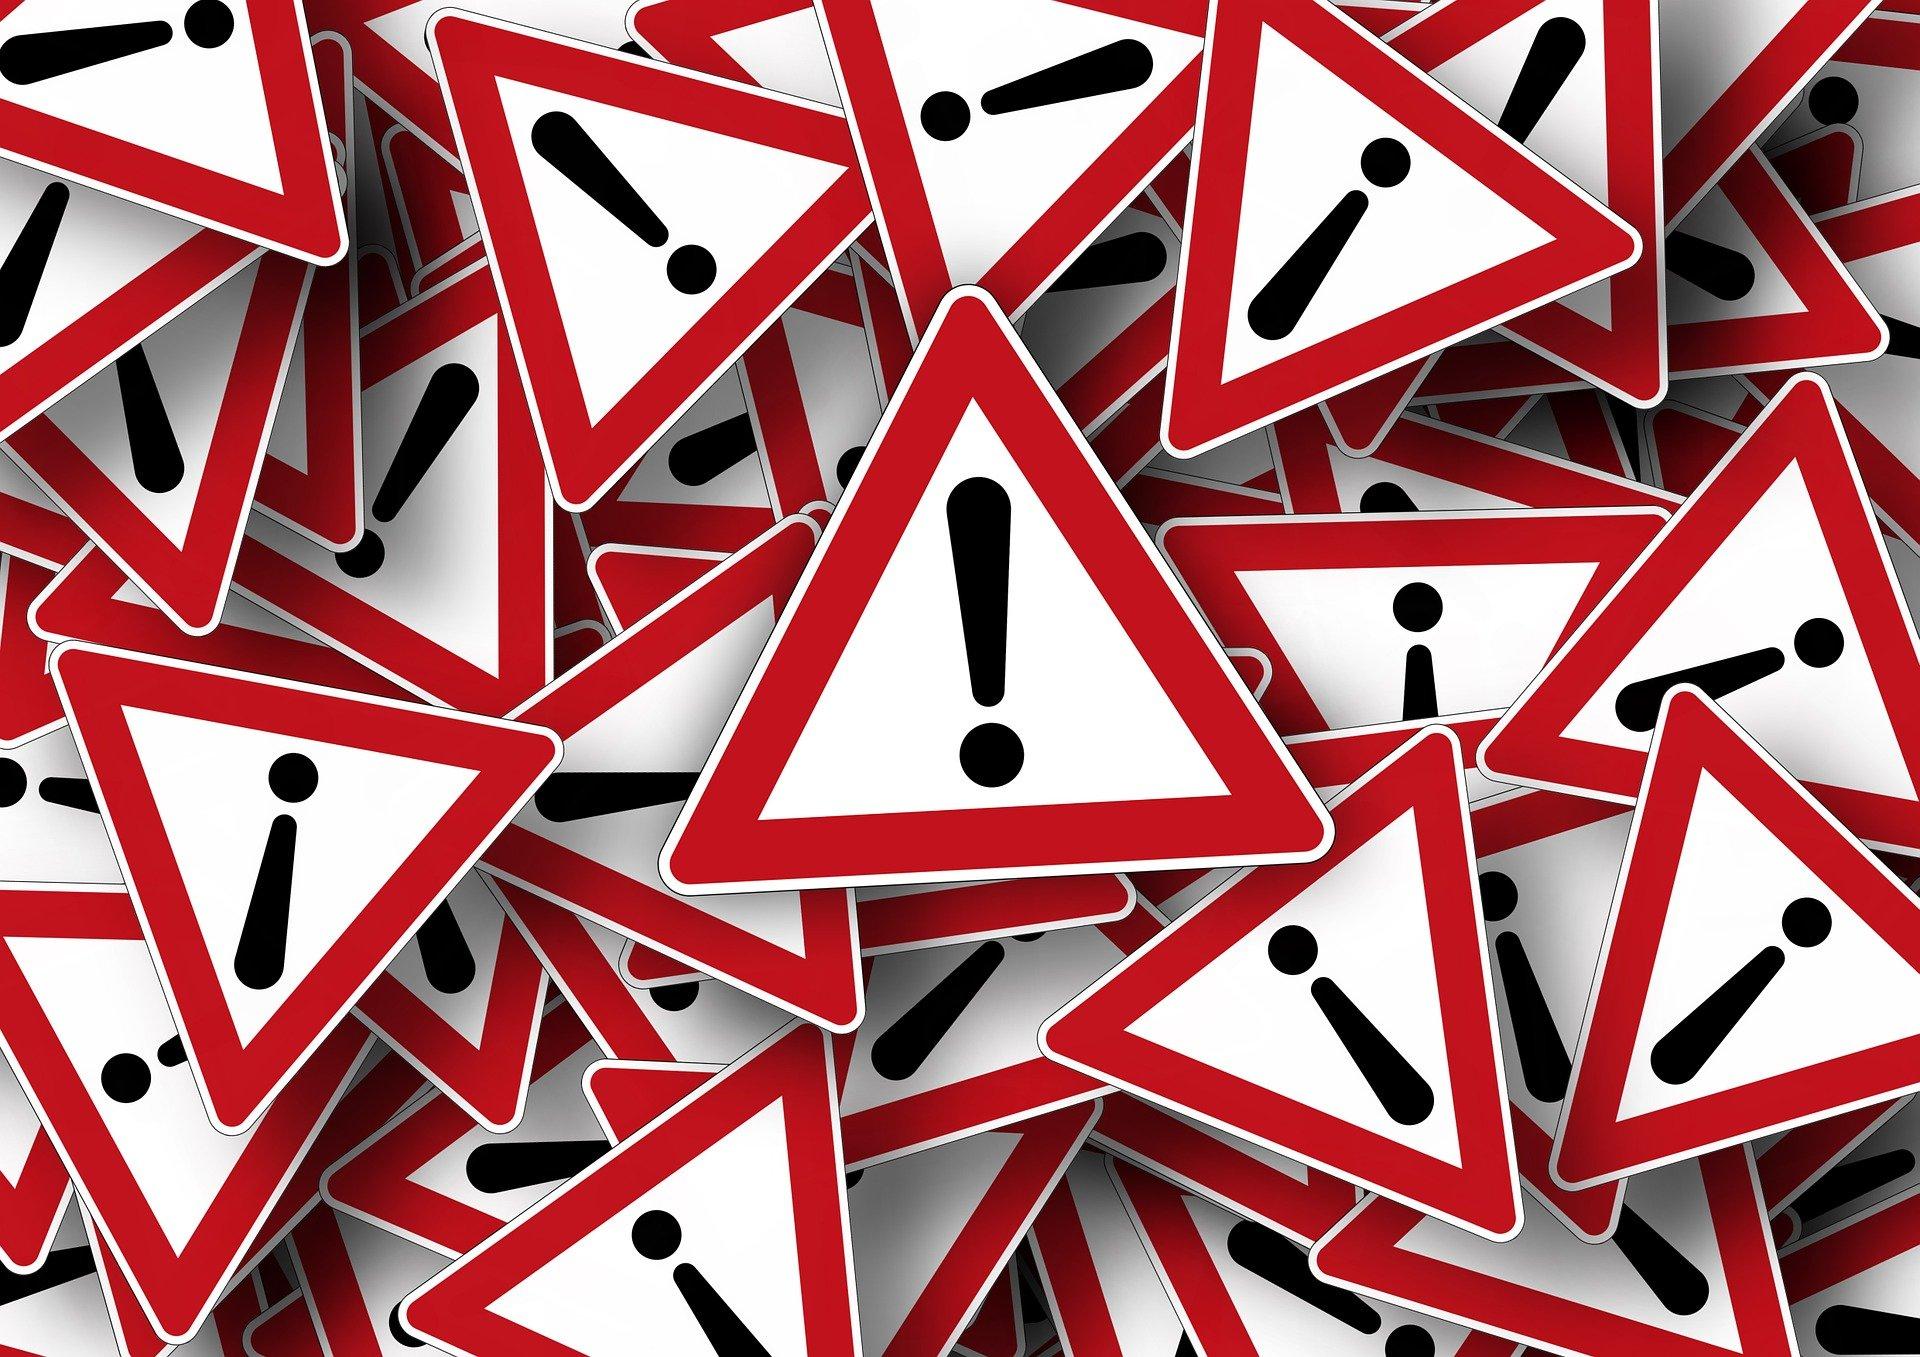 znaki drogowe - uwaga